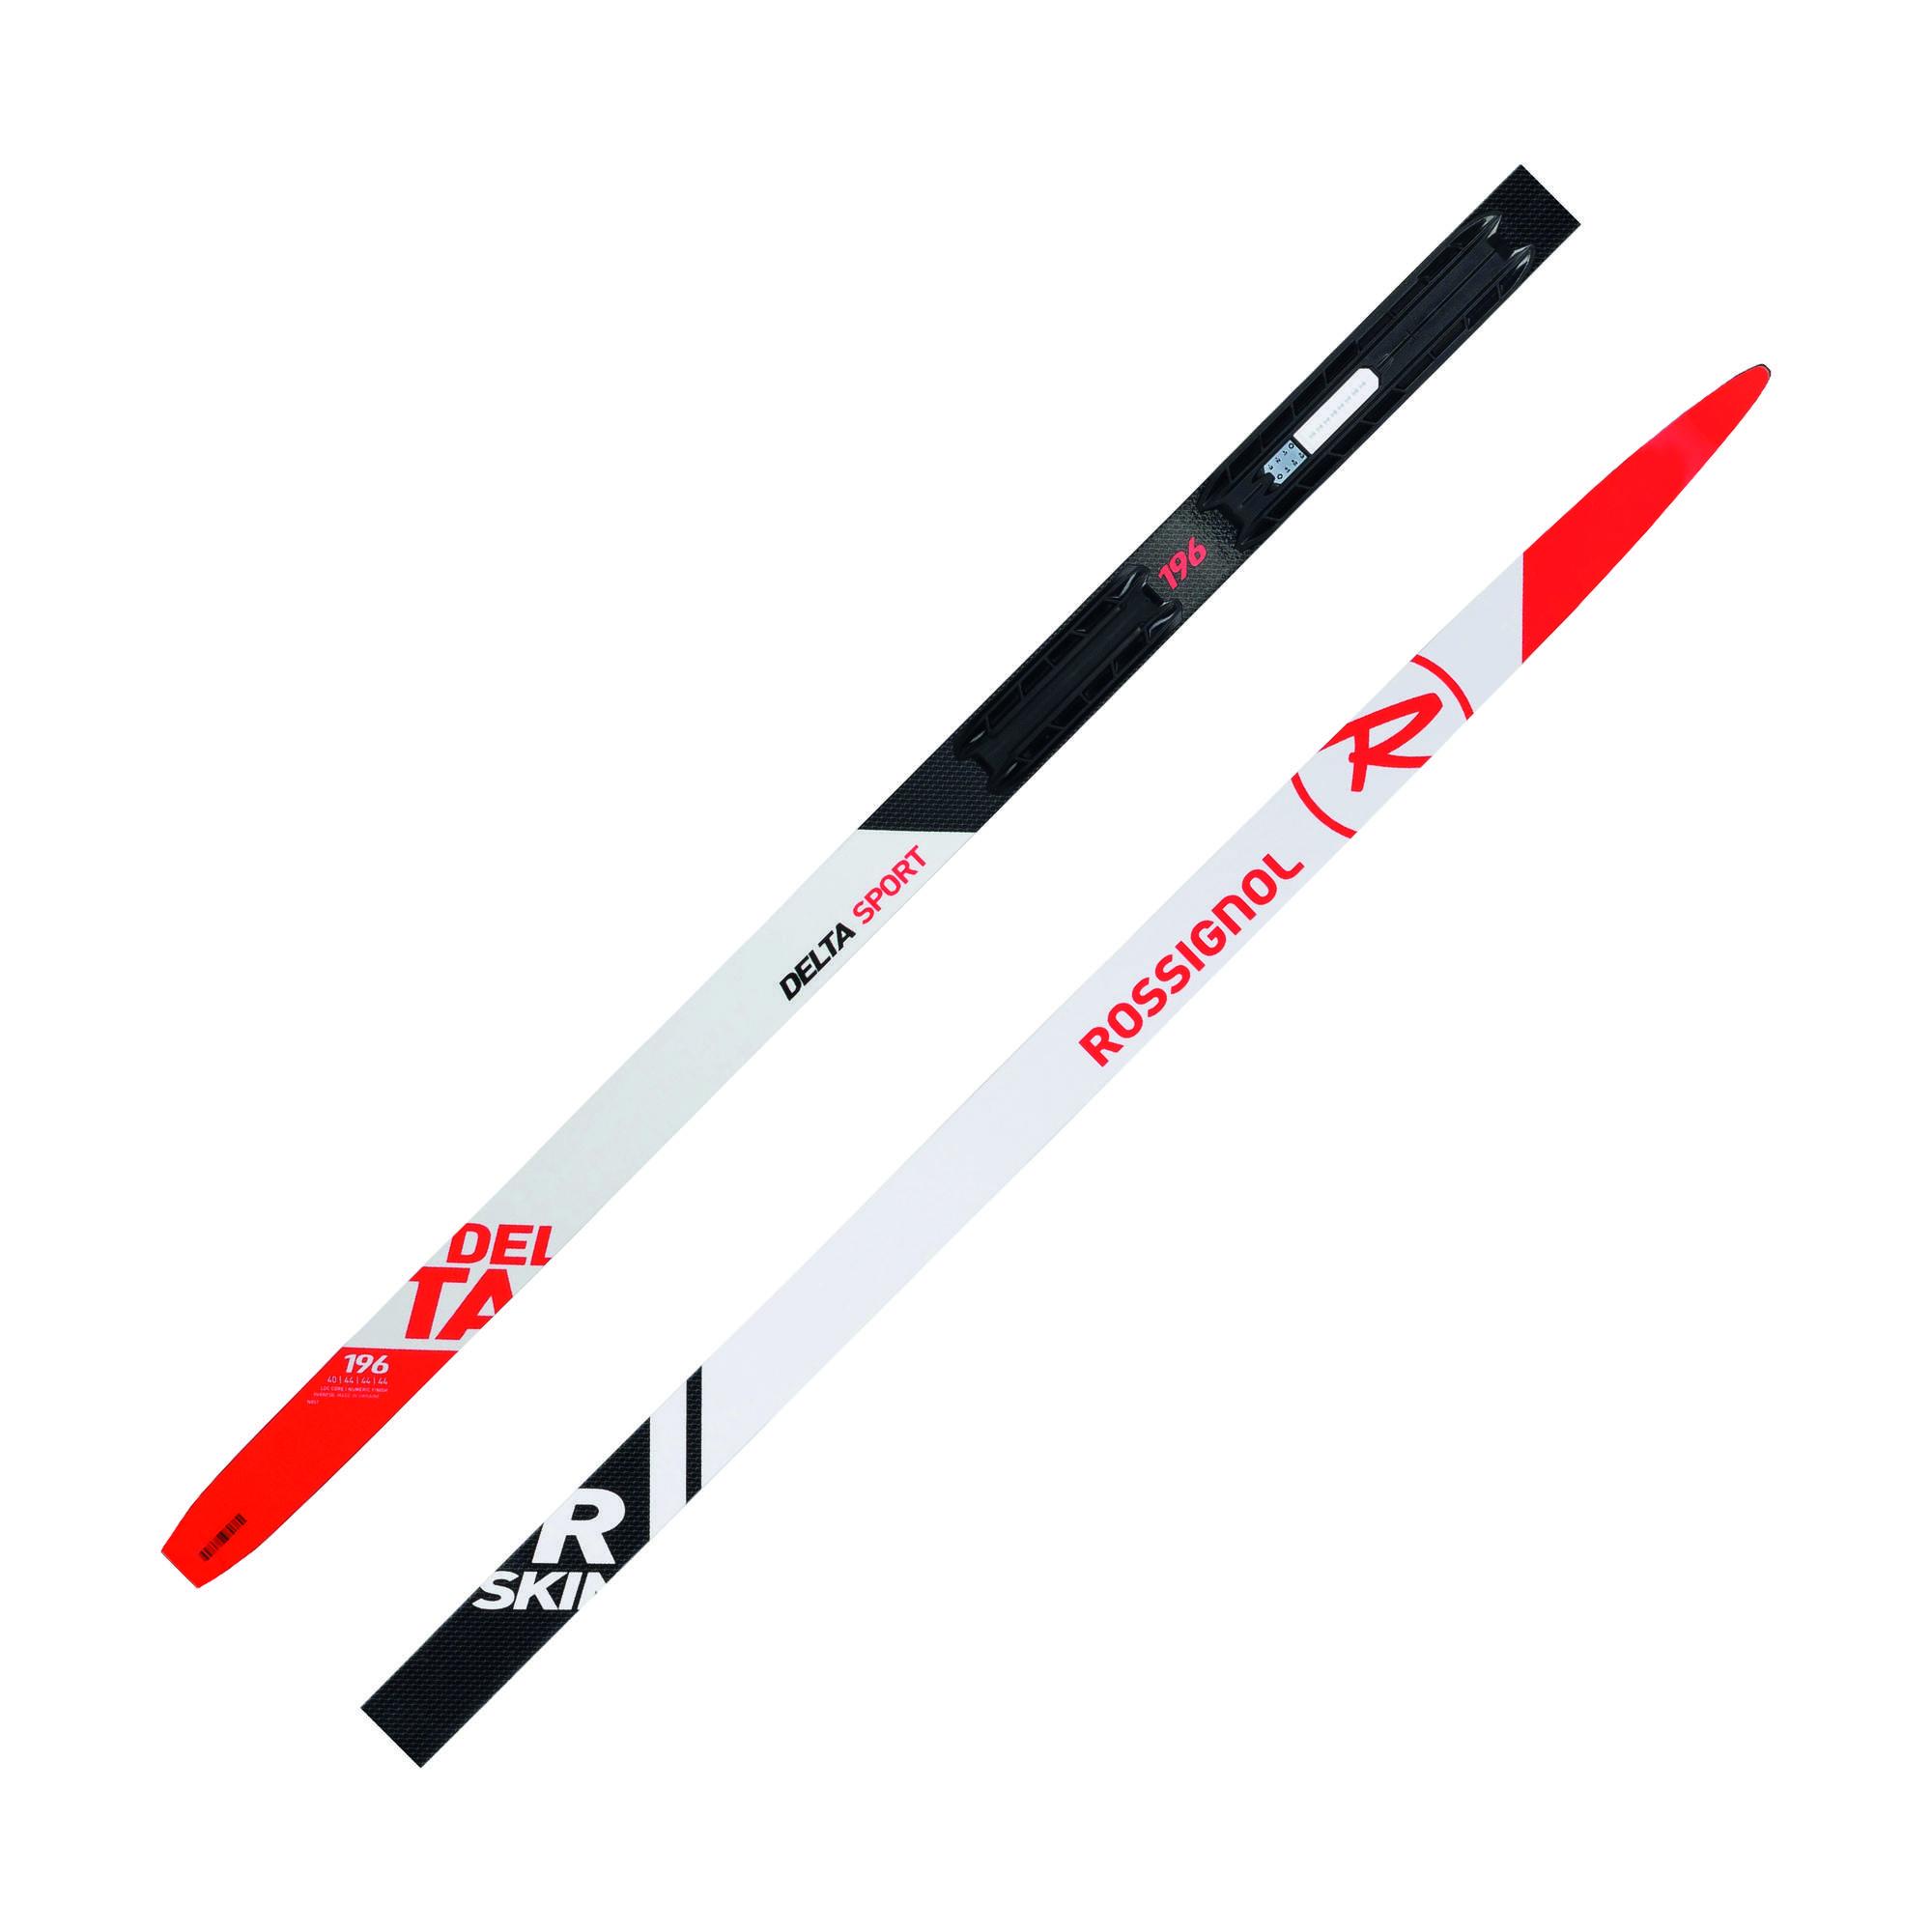 Rossignol Delta Sport R-Skin Stiff IFP  - extra harte R-Skin Race Langlauf Ski - 206 cm